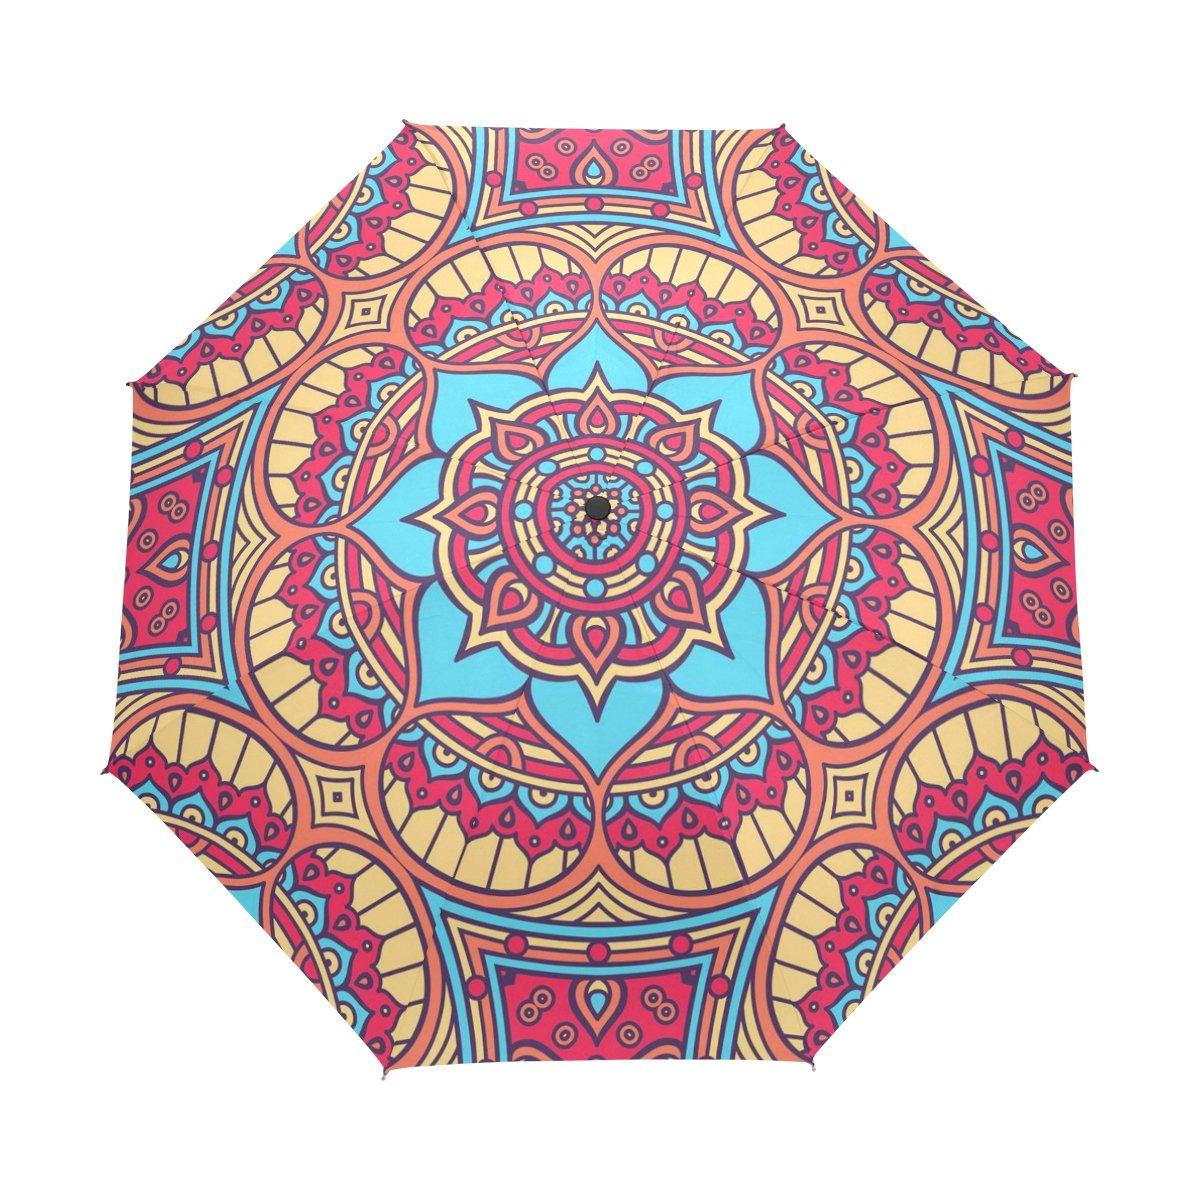 baihuishop防風ゴルフ傘、コンパクトで旅行for Easy Carryingスポーツ雨傘 – 強力なフレームUnbreakable曼荼羅花パターン   B01M152ILQ